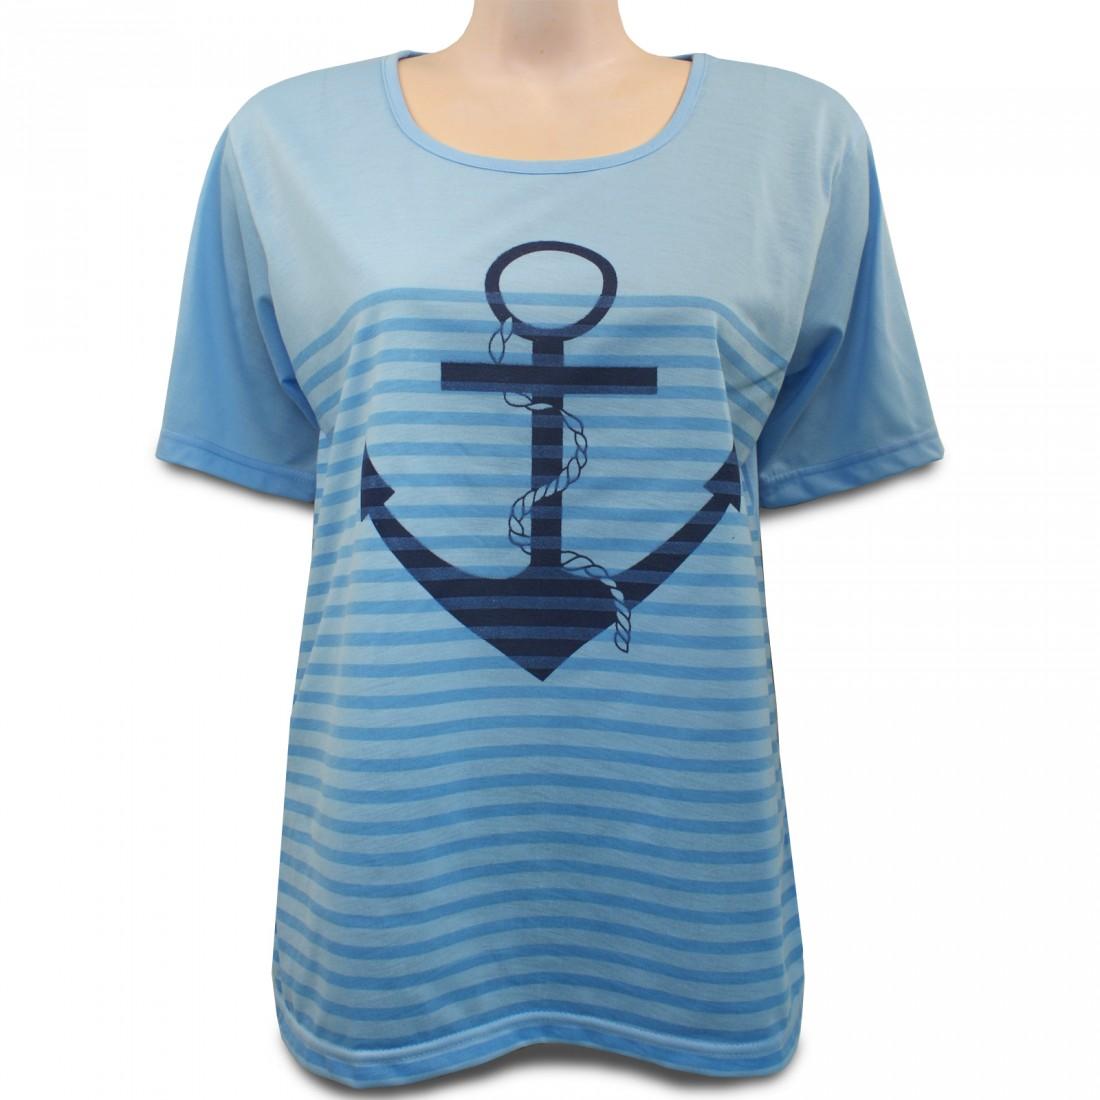 shirt mit anker druckmotiv in trendigen farben damen shirts t shirts. Black Bedroom Furniture Sets. Home Design Ideas